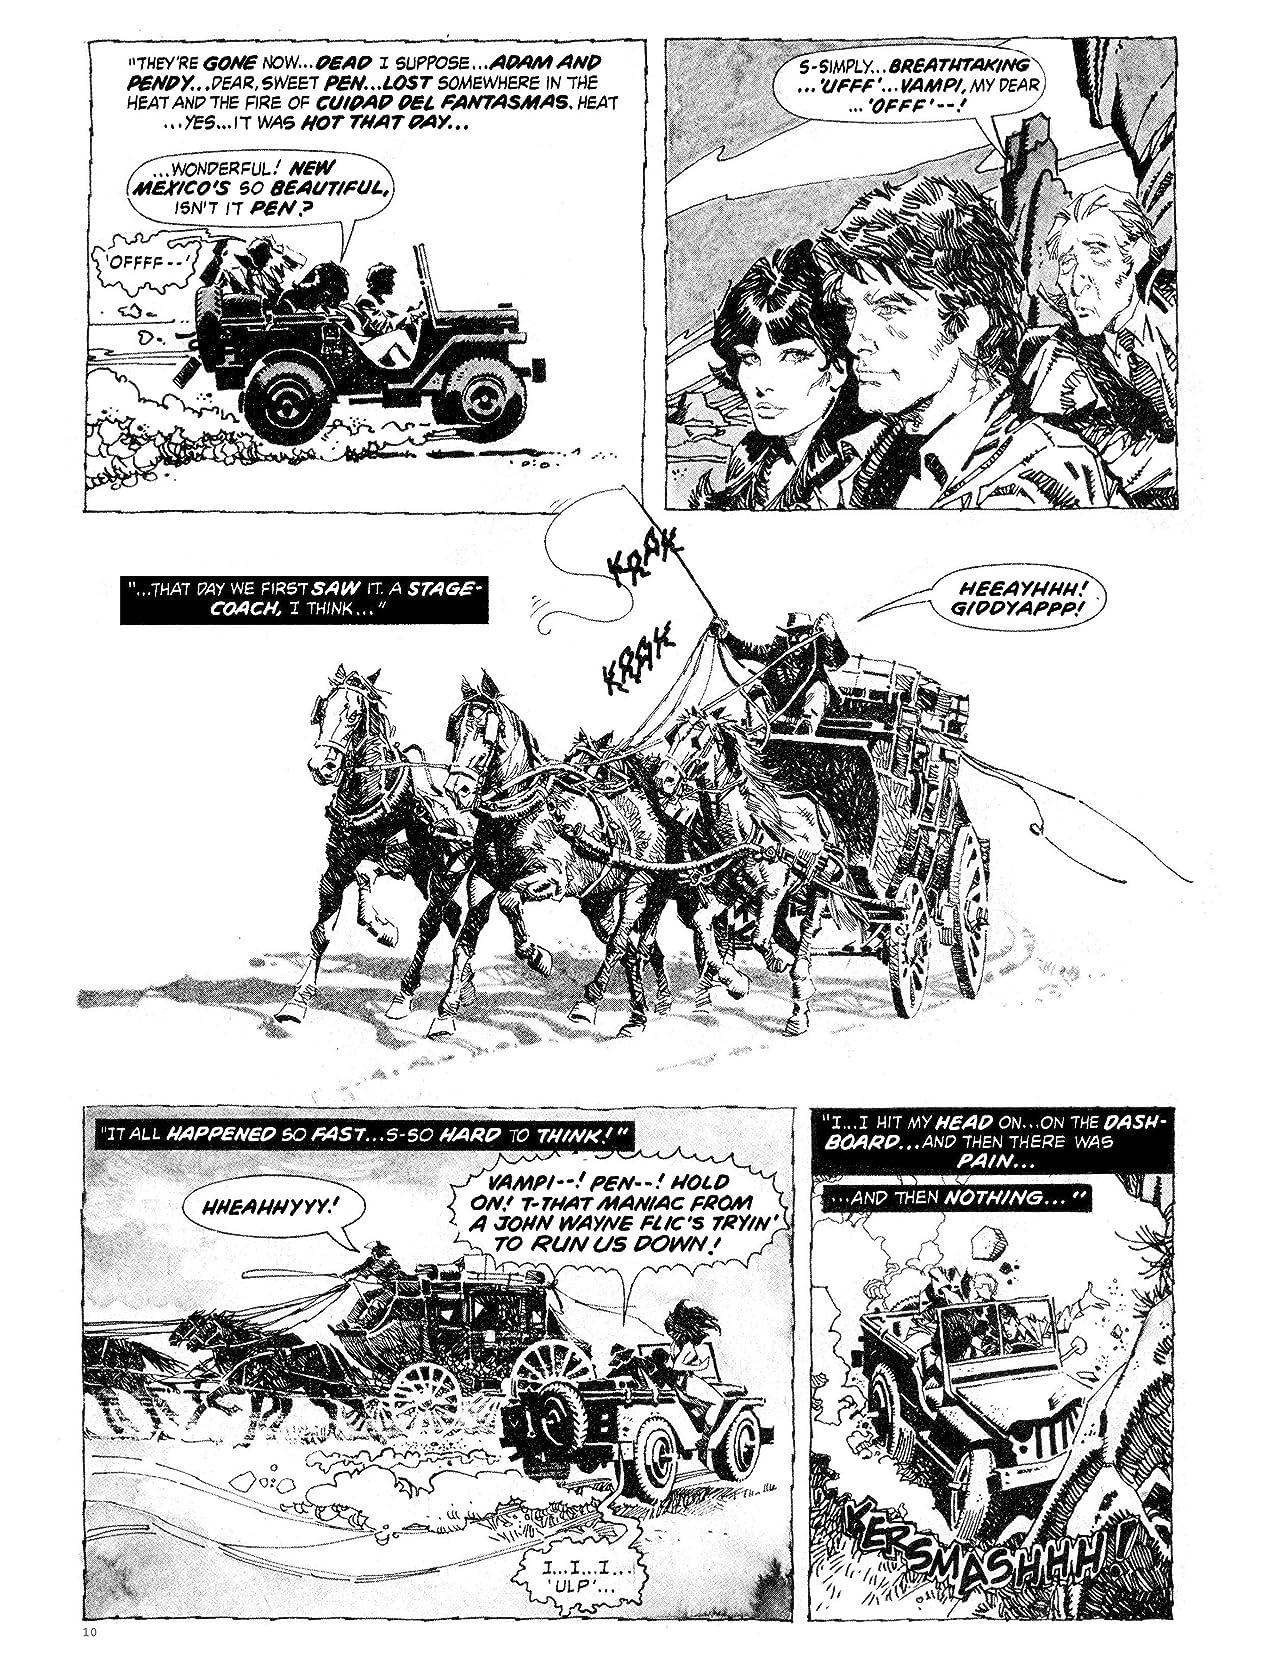 Vampirella (Magazine 1969-1983) #57